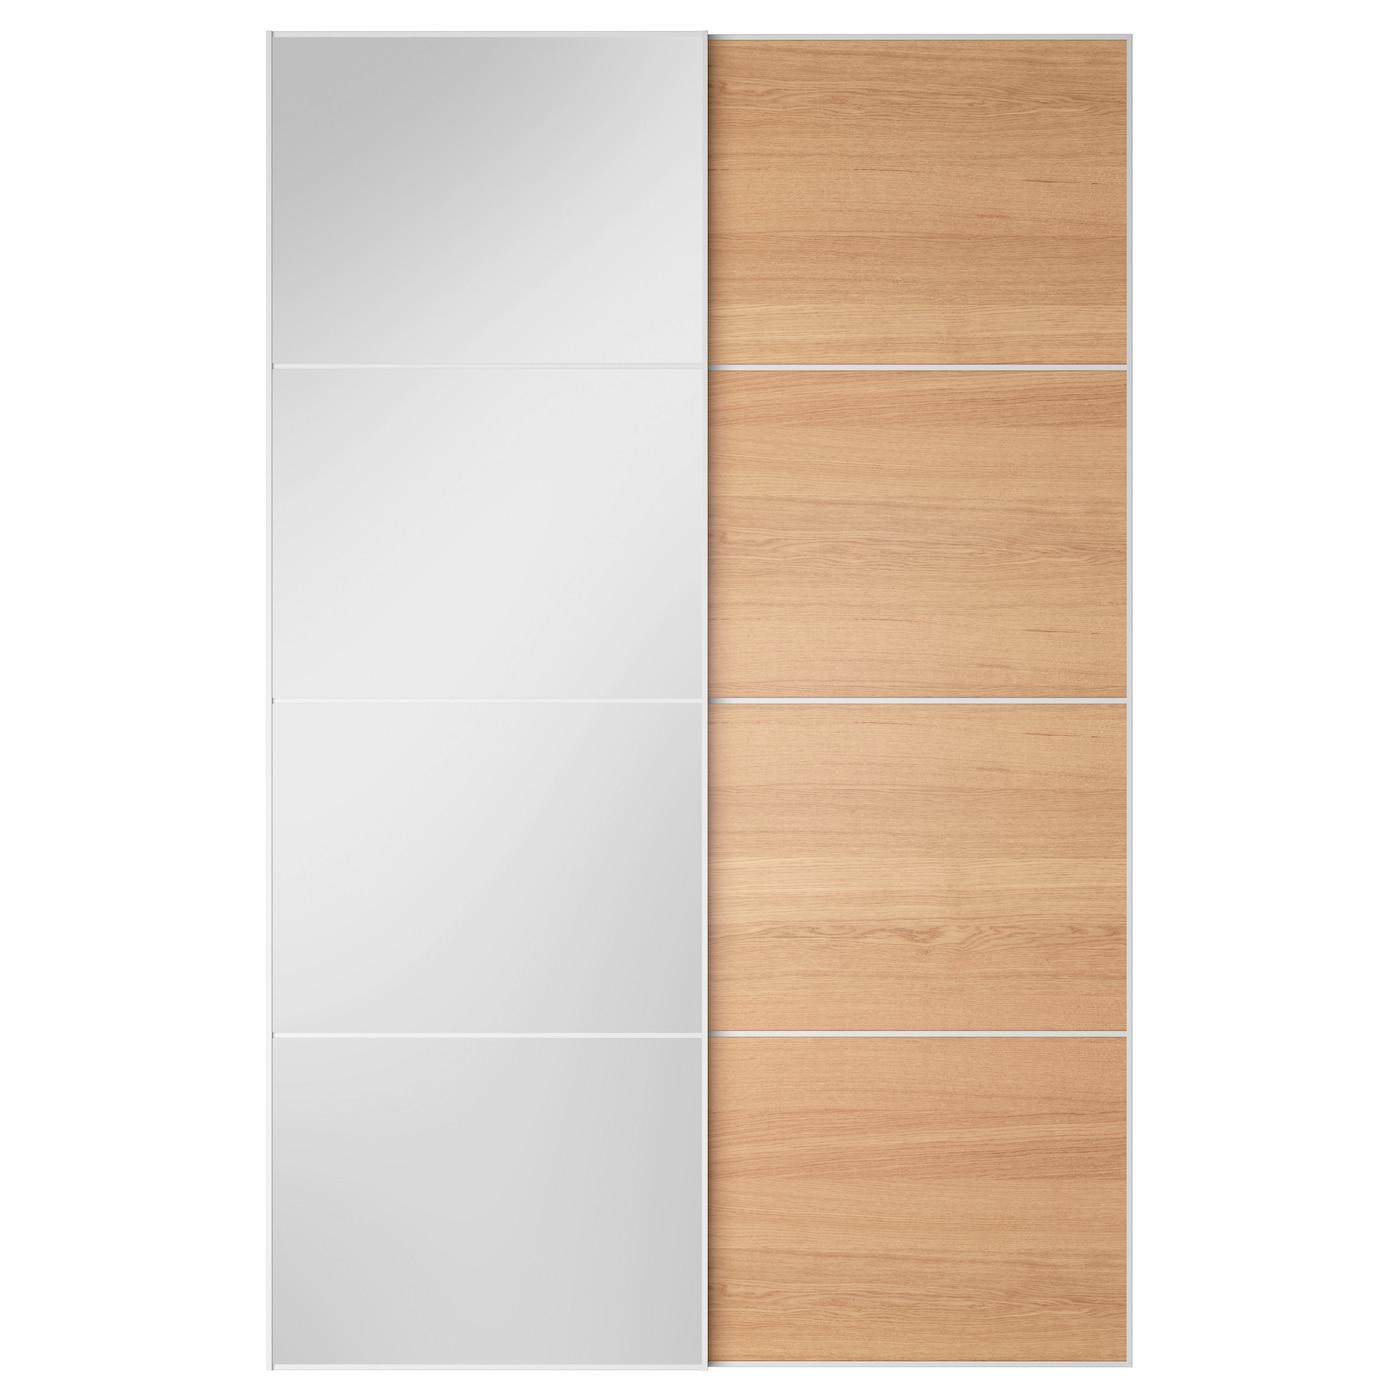 AULI ILSENG Pair Of Sliding Doors Mirror Glass Oak Veneer 150x236 Cm IKEA